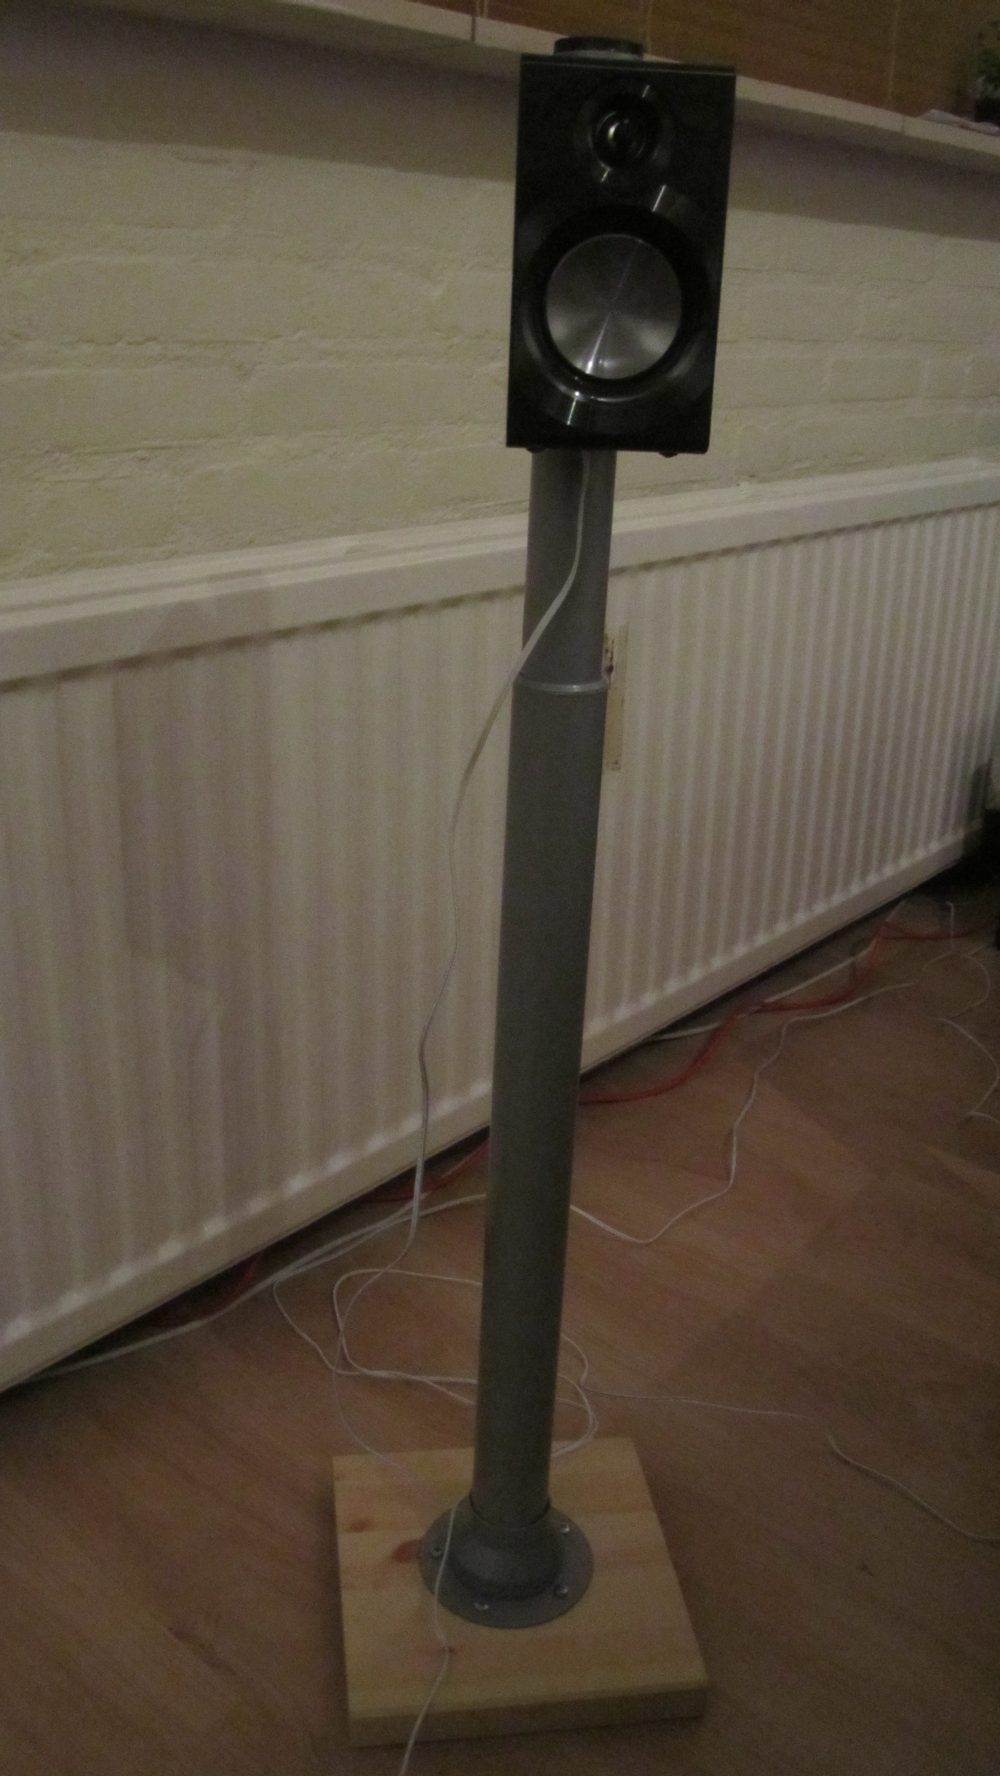 5 1 rear speaker stand vika kaj shelves diy speakers diy furniture diy. Black Bedroom Furniture Sets. Home Design Ideas